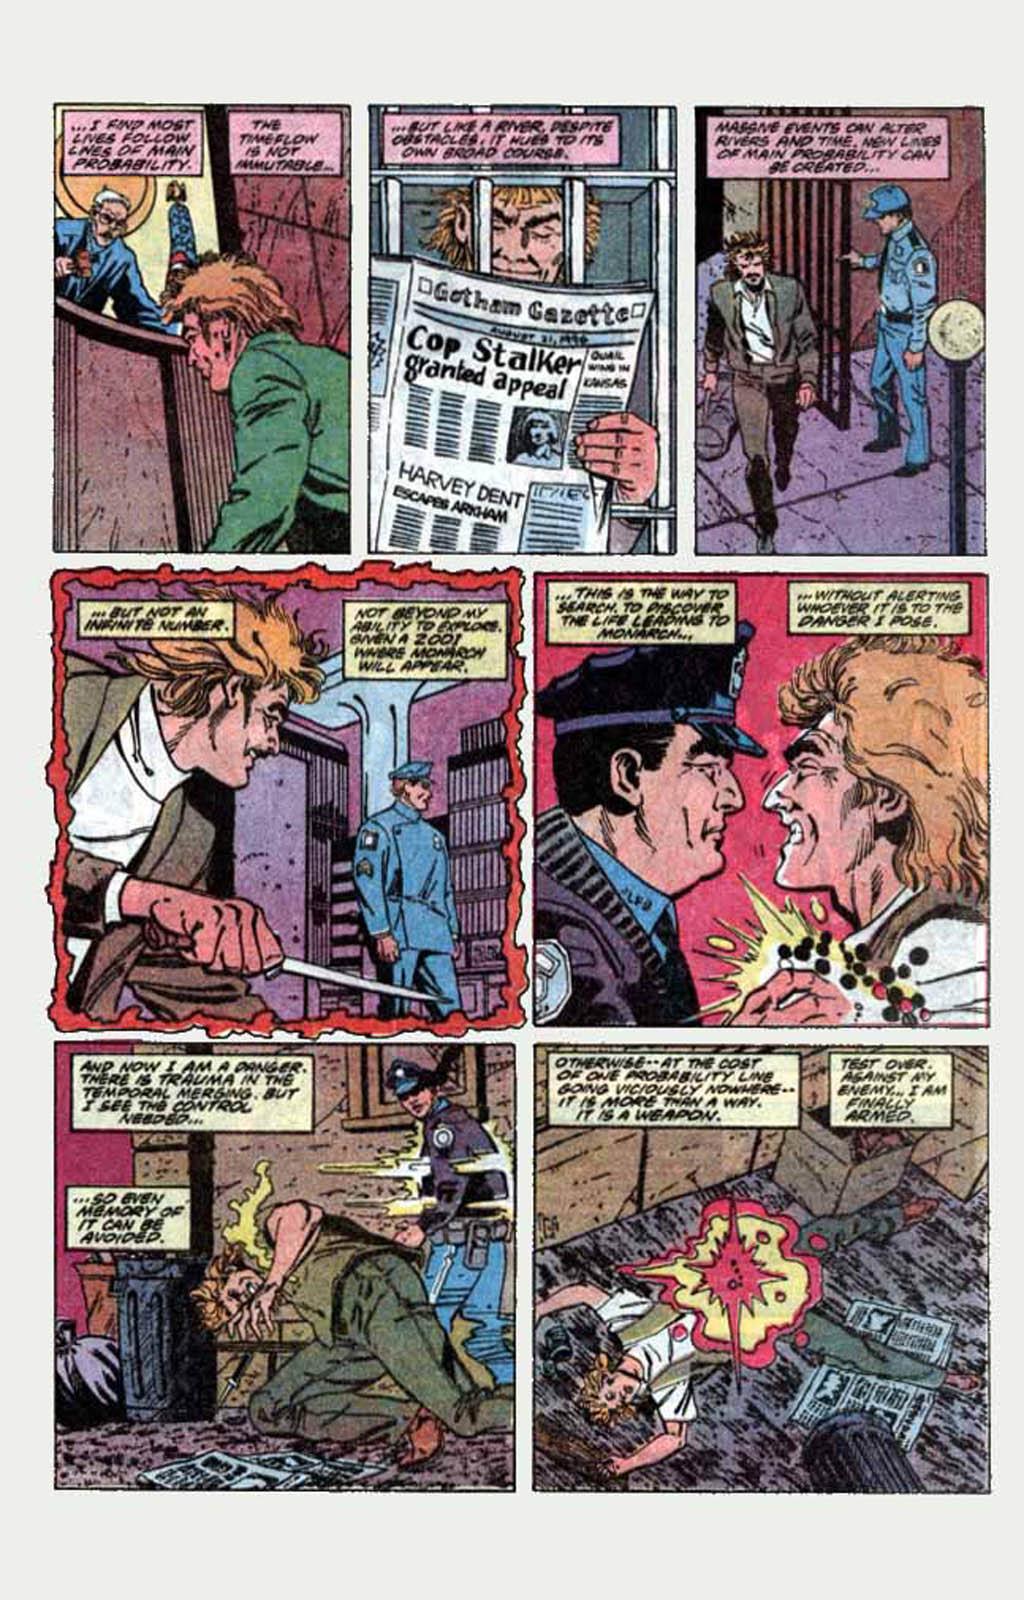 Read online Armageddon 2001 comic -  Issue #1 - 56